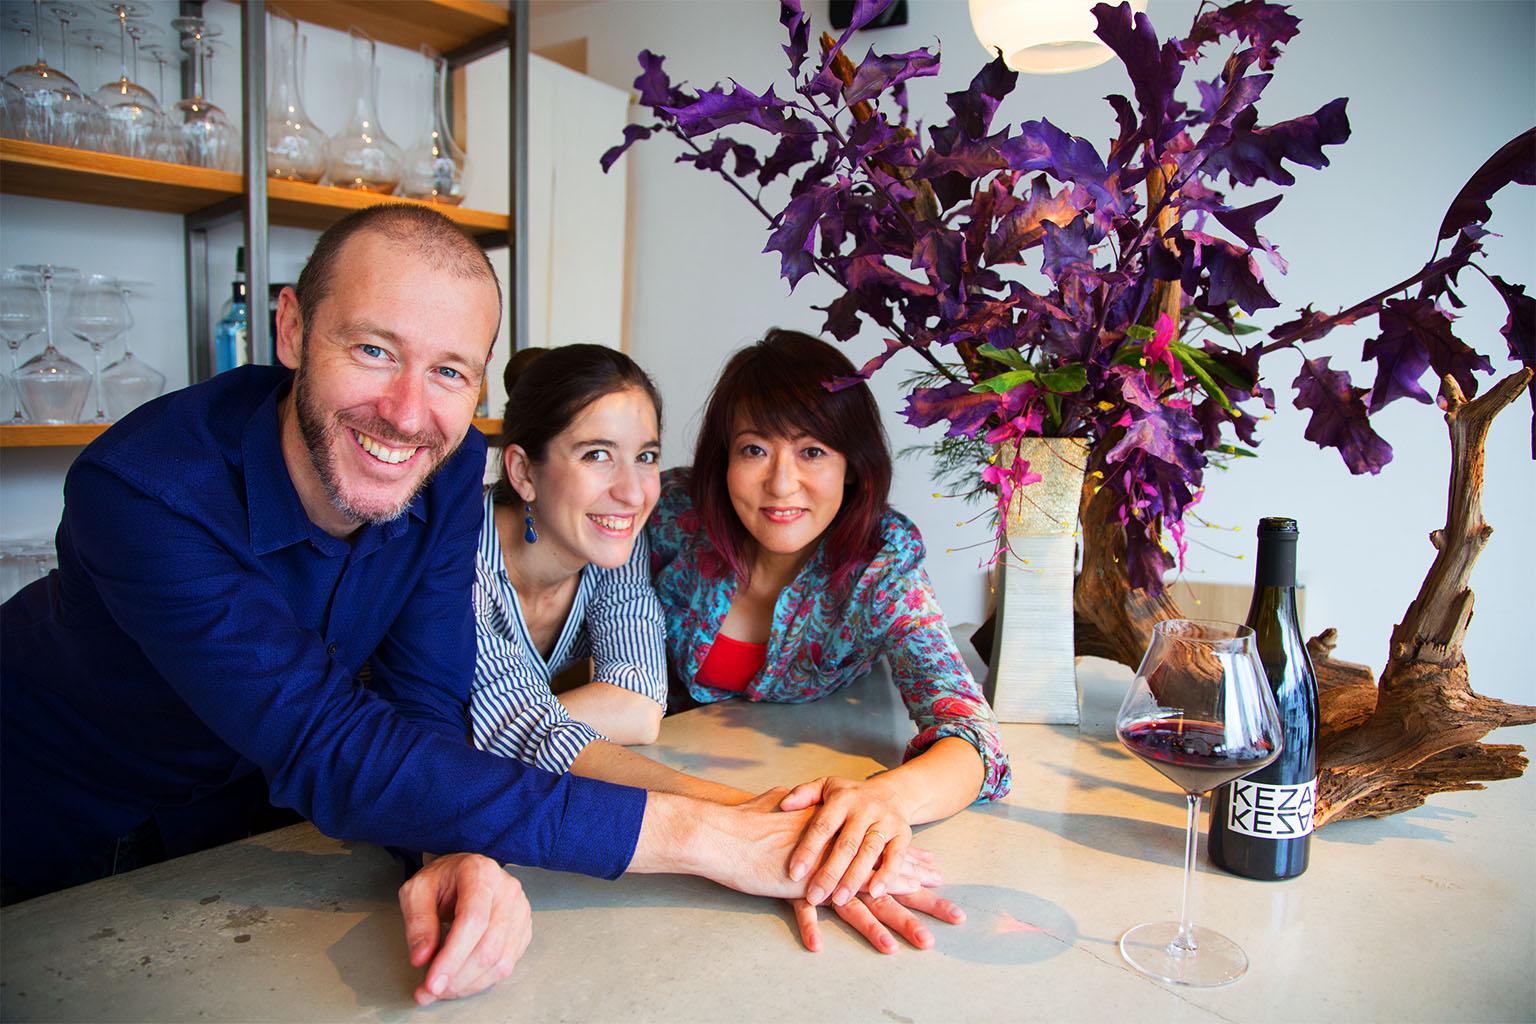 Atelier Fleur et Dégustation de Vin ! - アペロ ワインバー / オーガニックワインxフランス家庭料理 - 東京都港区南青山3-4-6 / apéro WINEBAR - vins et petits plats français - 2016